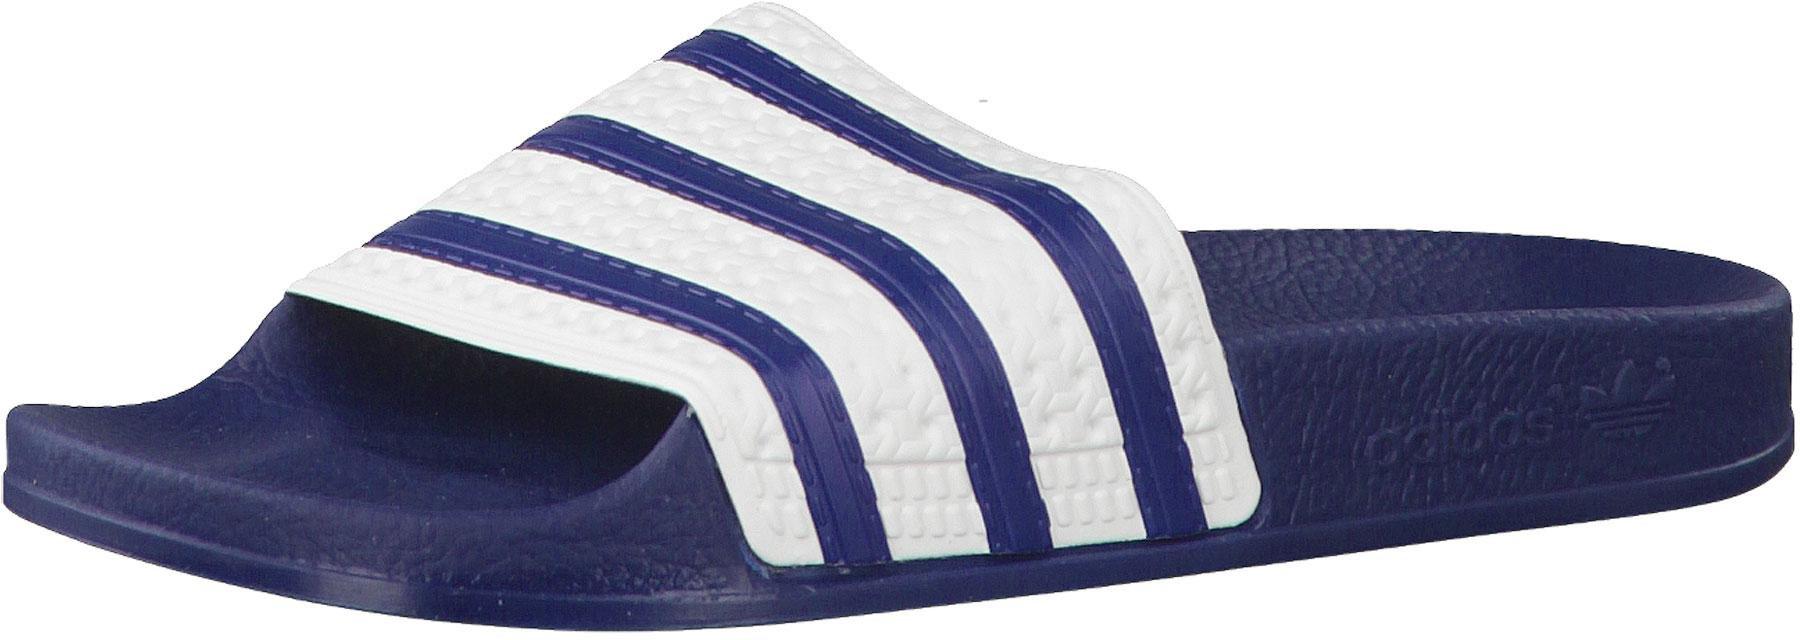 adidas Originals Adilette Blau Weiß